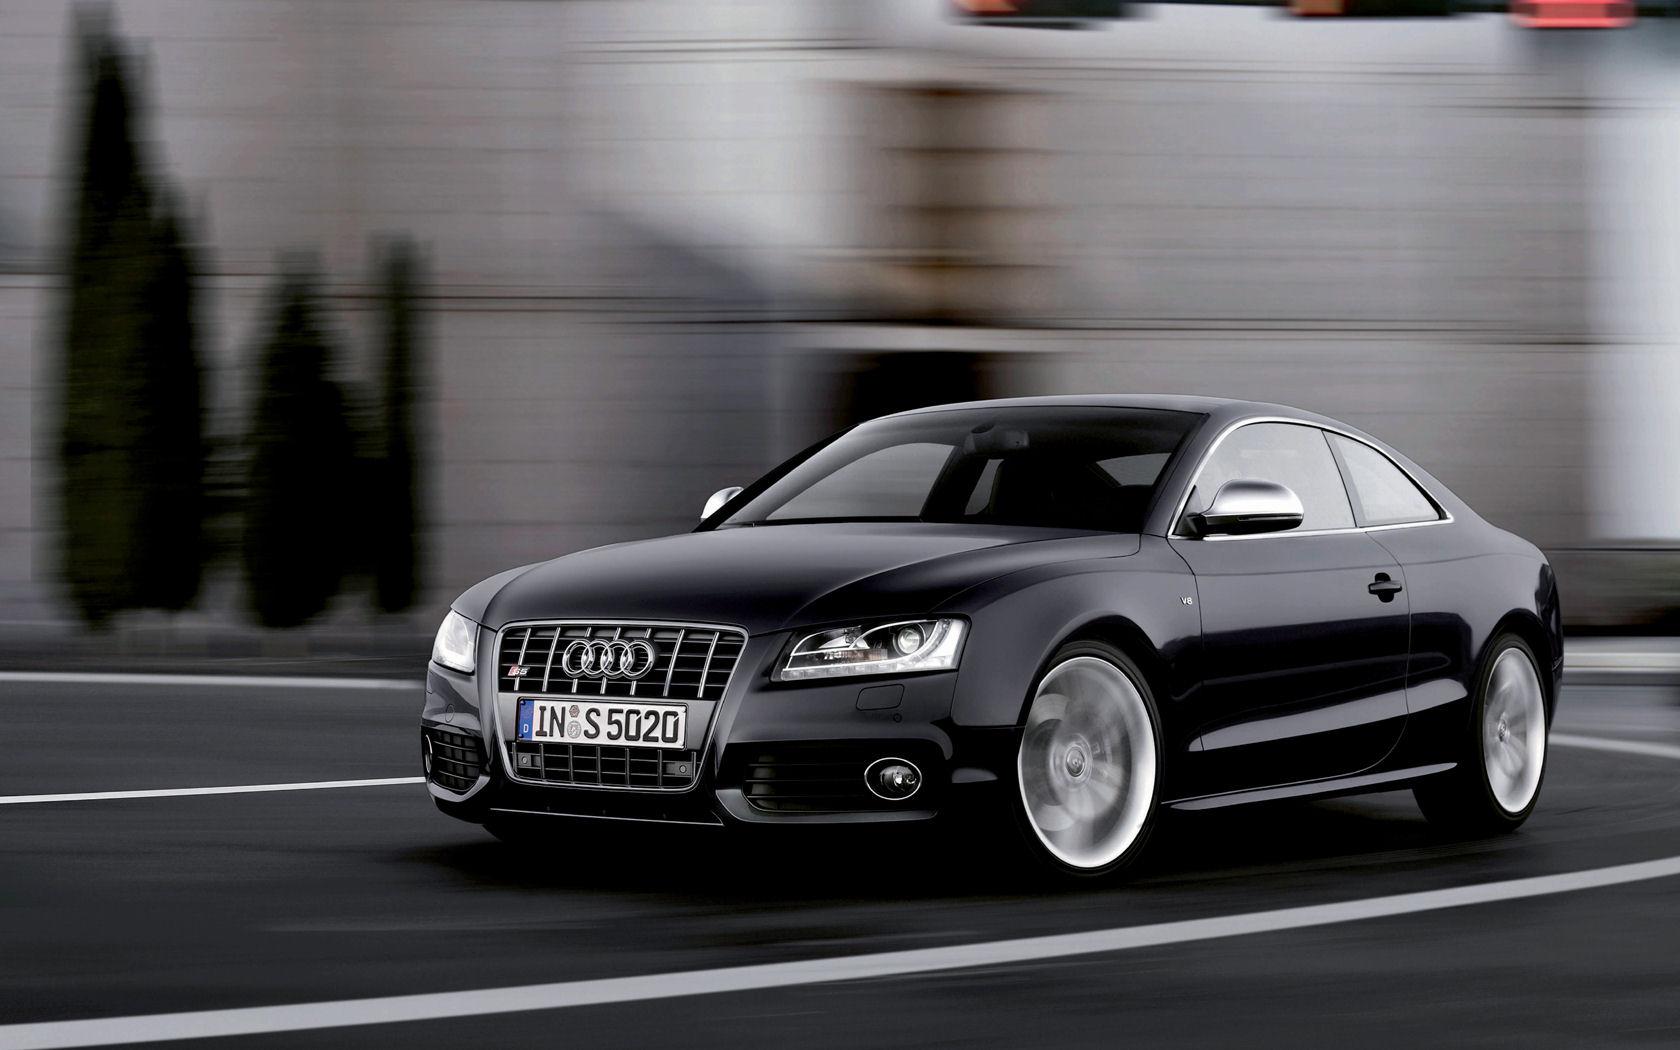 Audi A5 Wallpapers Hd Audi S5 Coupe 2007 1680x1050 Download Hd Wallpaper Wallpapertip